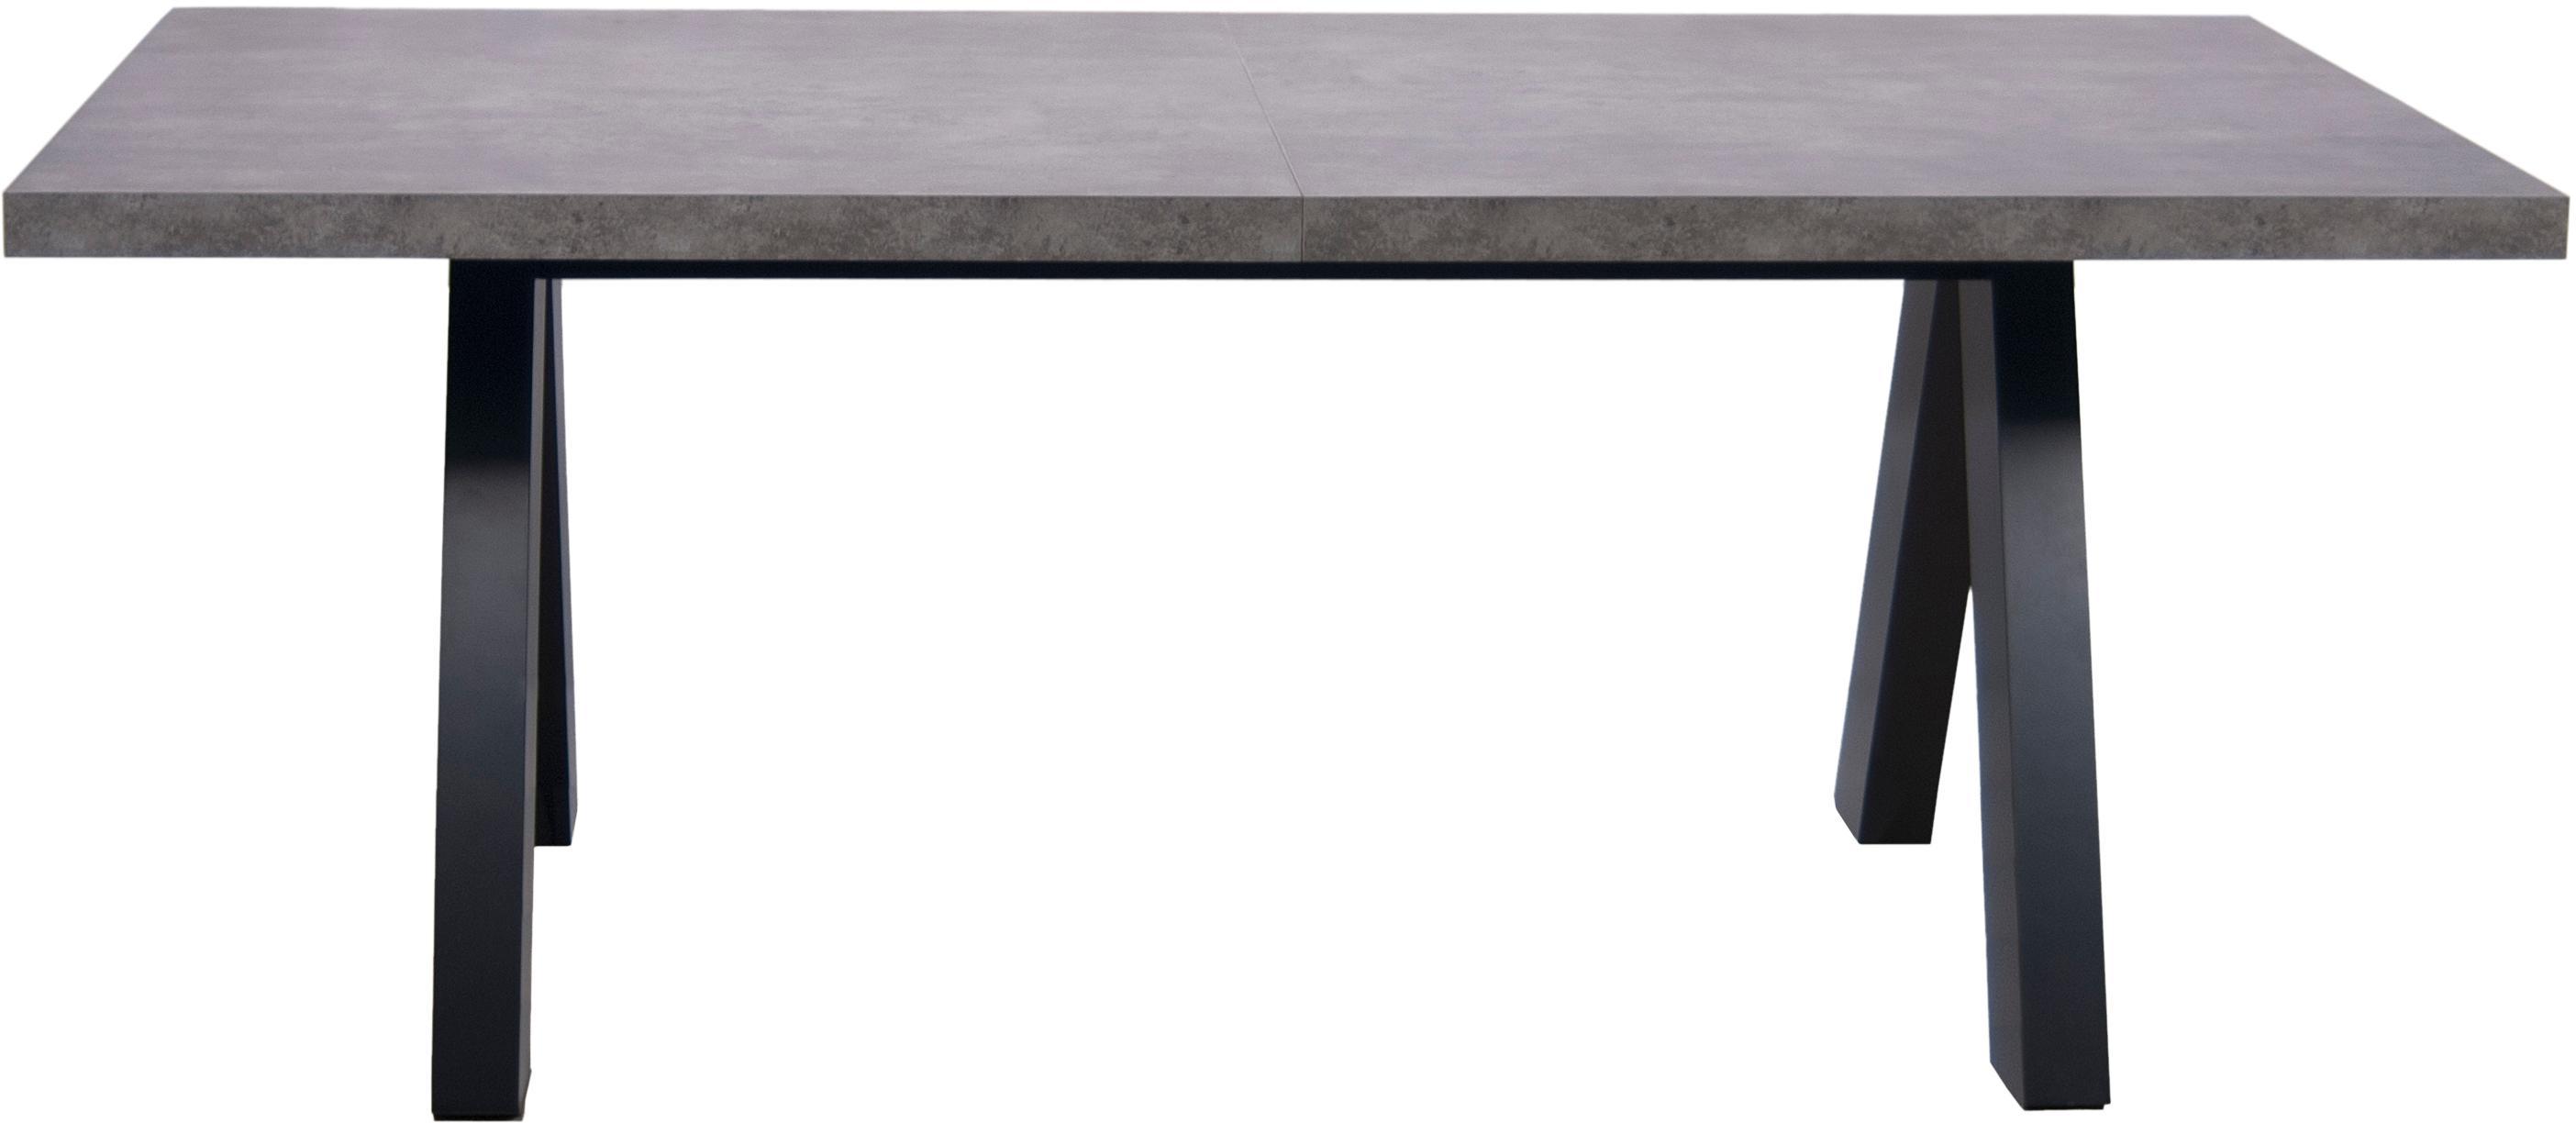 Mesa de comedor extensible en cemento Apex, Tablero: estructura ligera de pana, Patas: fibras de densidad media, Imitación de cemento, negro, An 200-250 x F 100 cm